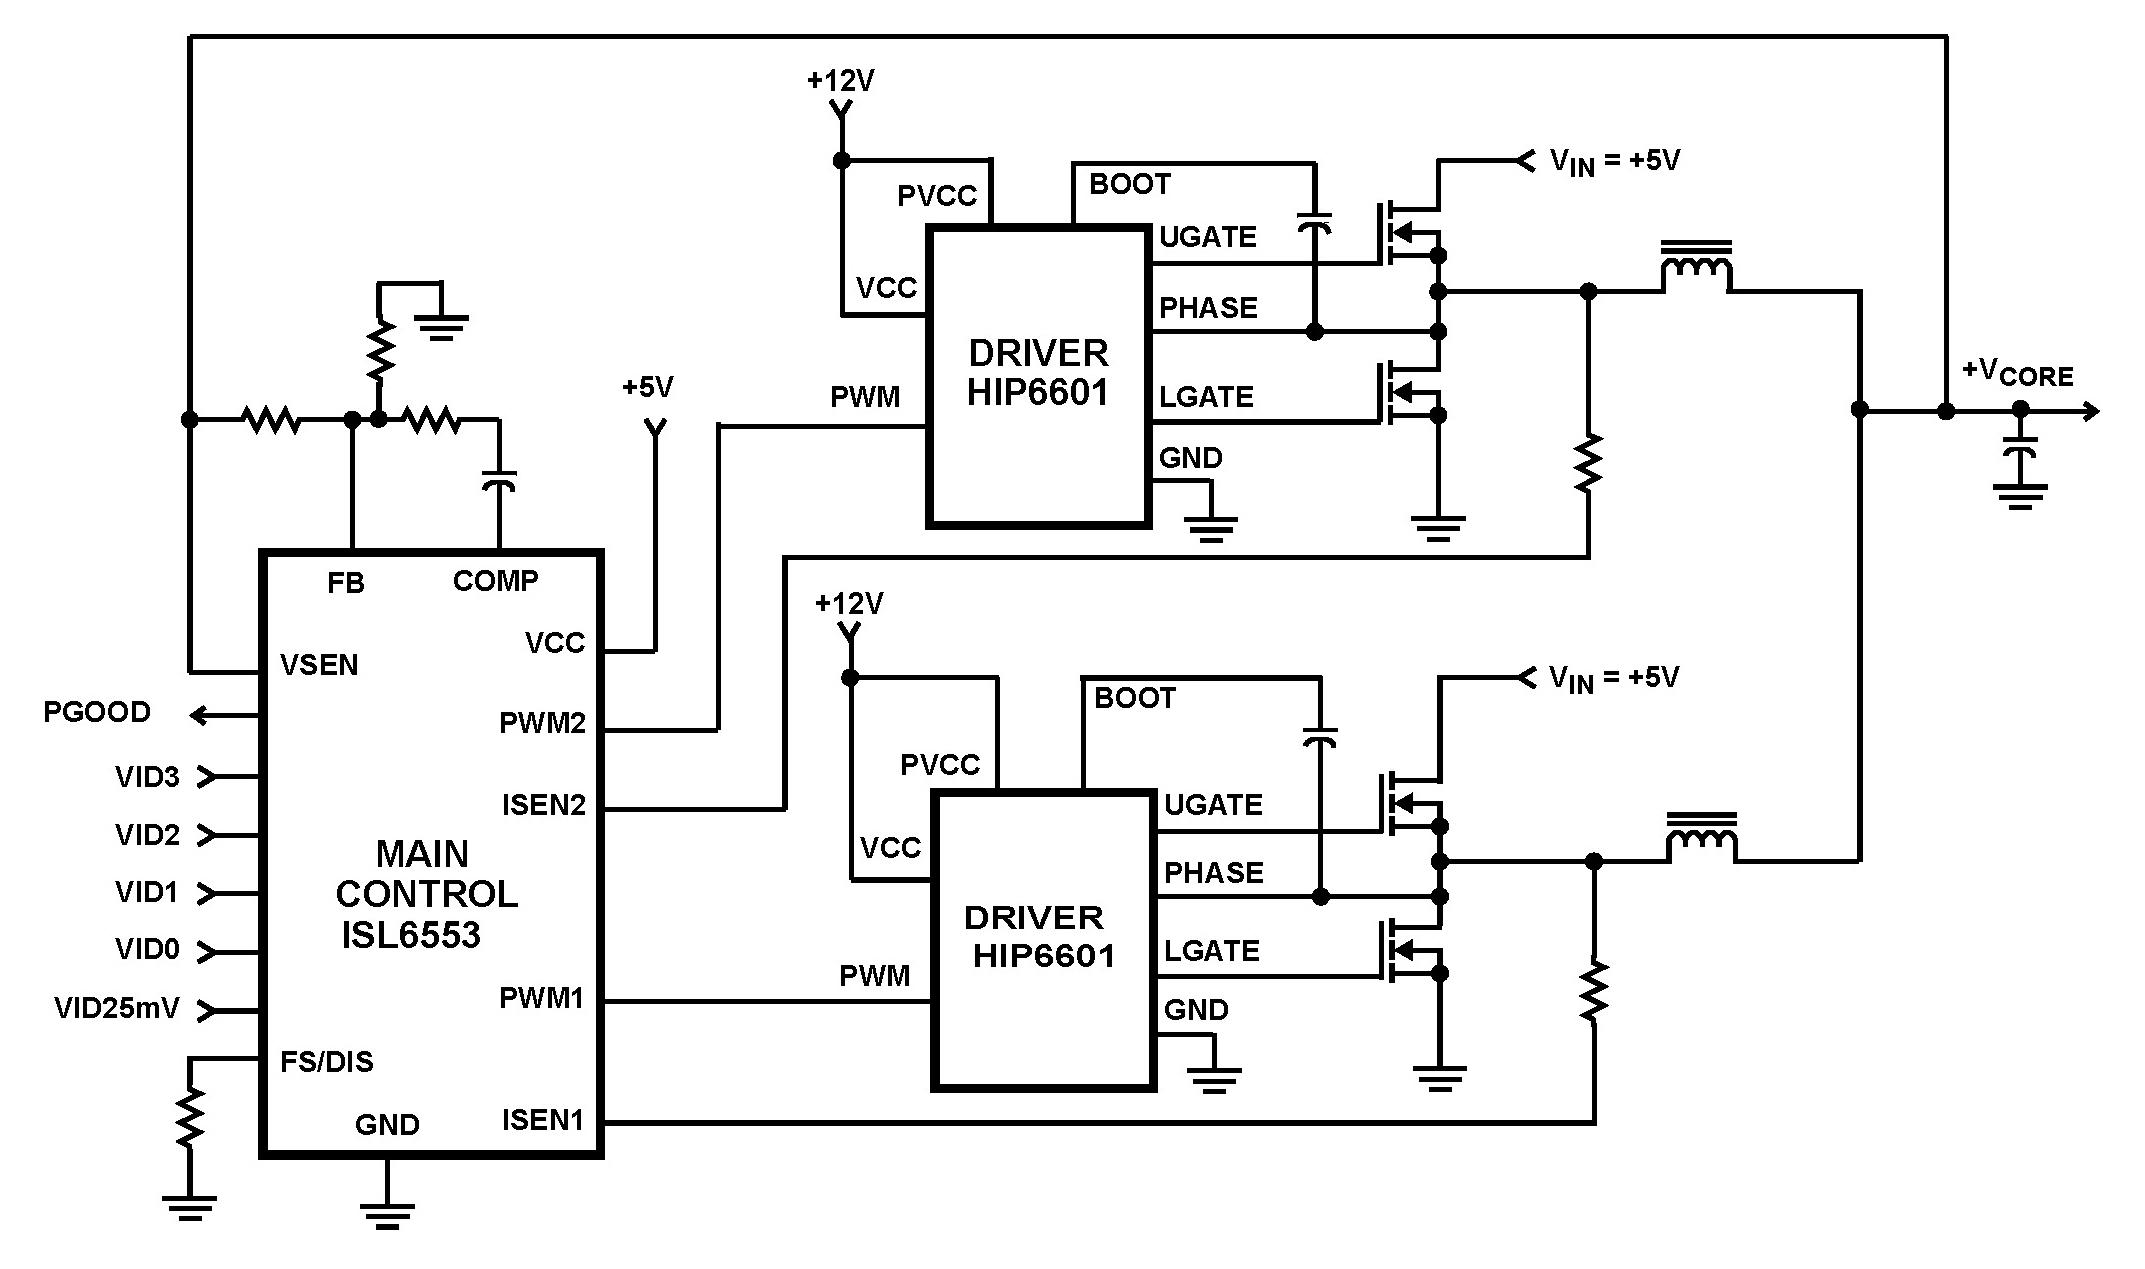 ISL6553 Microprocessor CORE Voltage Regulator 2 Phase Buck